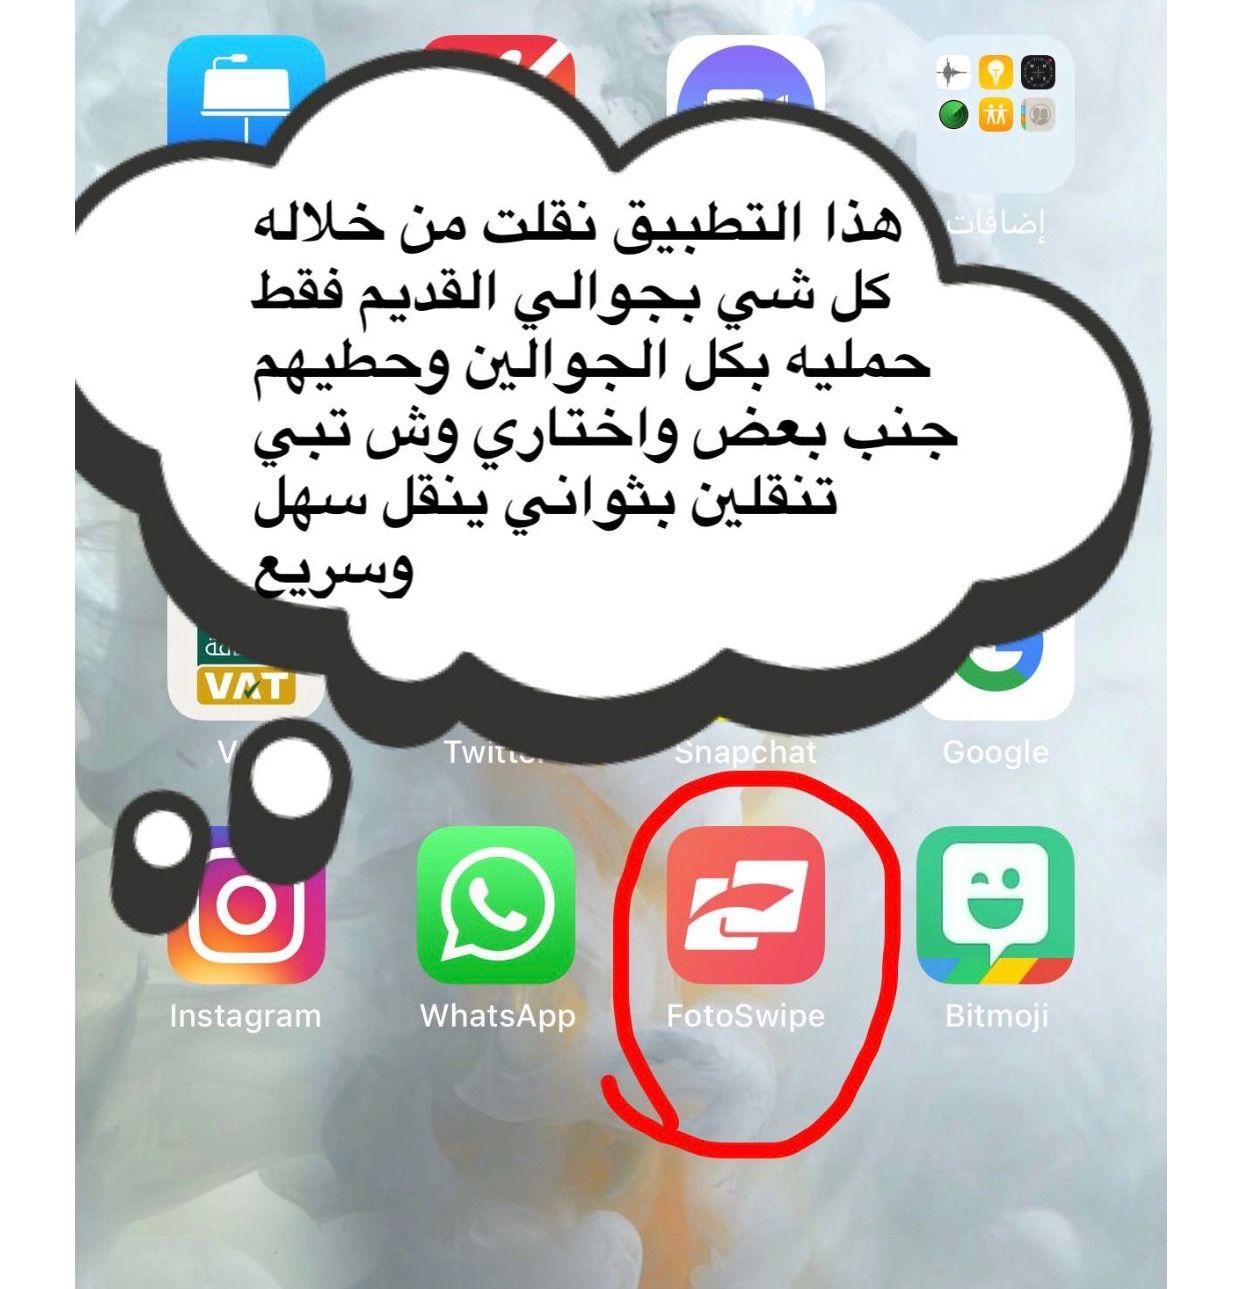 Pin by عهود الحربي on مدرسه in 2020 Application iphone